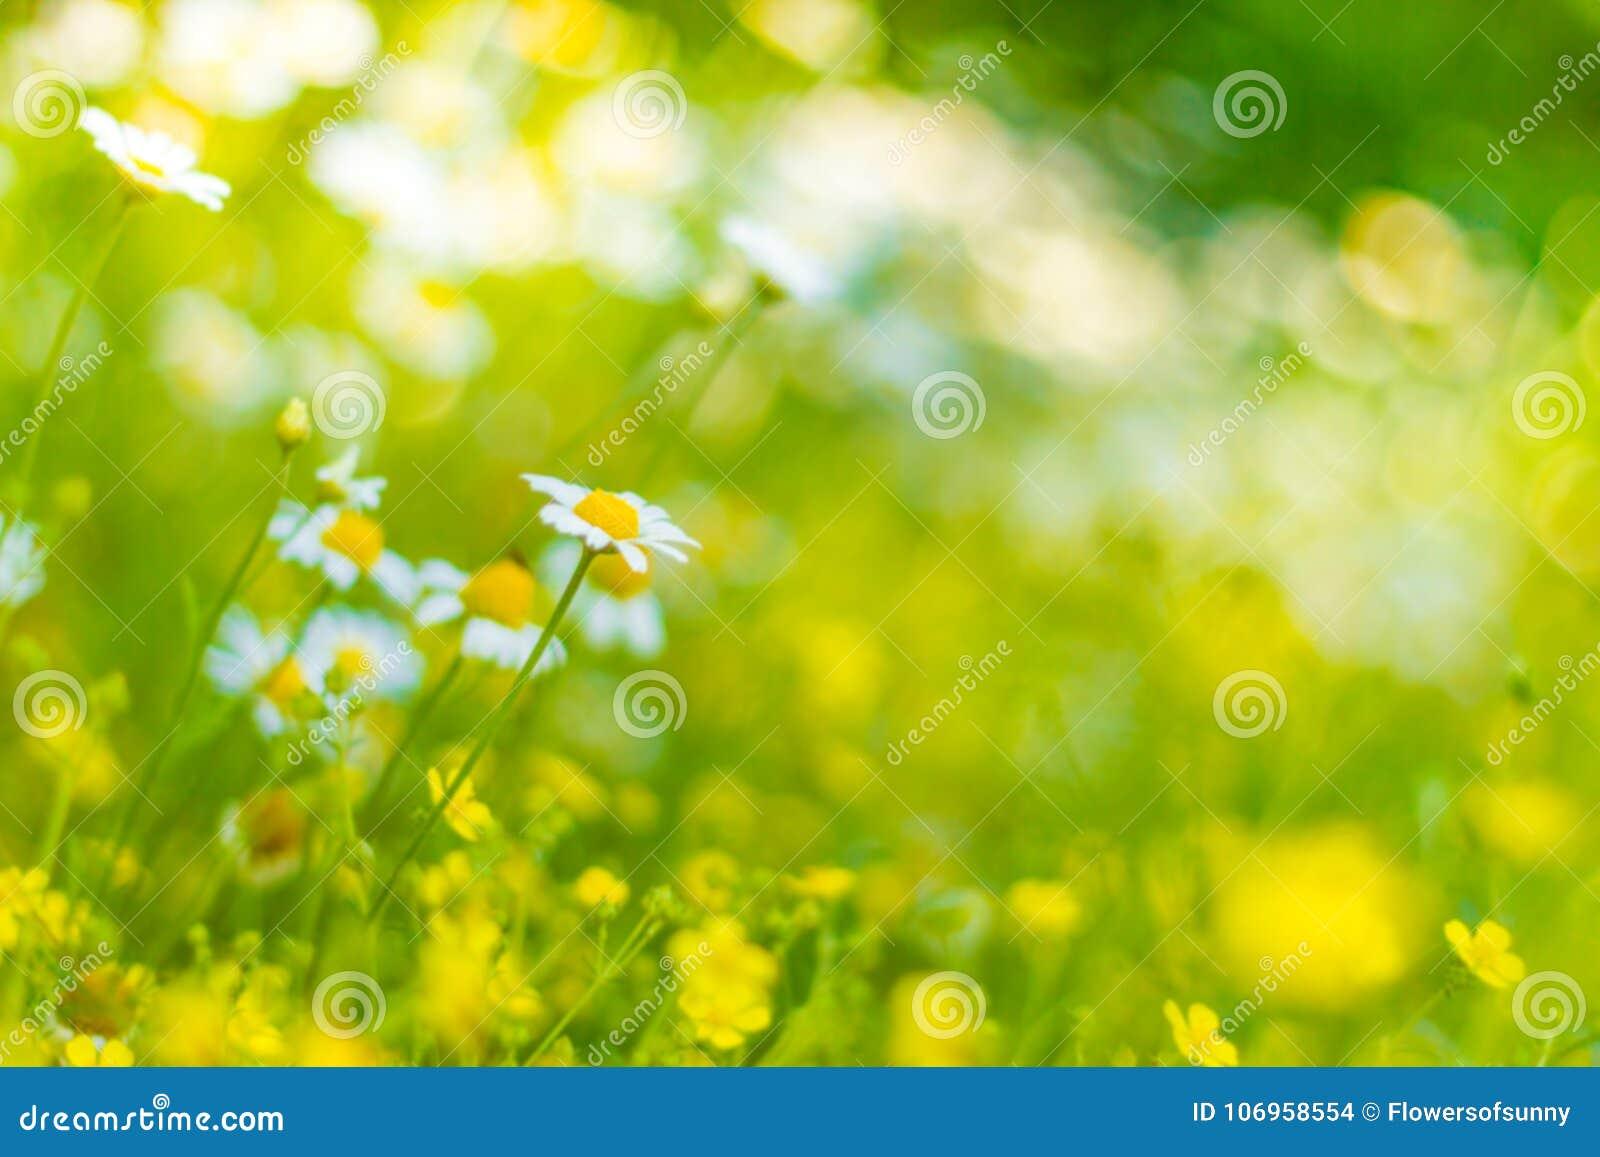 Closeup of dandelion on natural background under sunlight. Inspirational nature concept